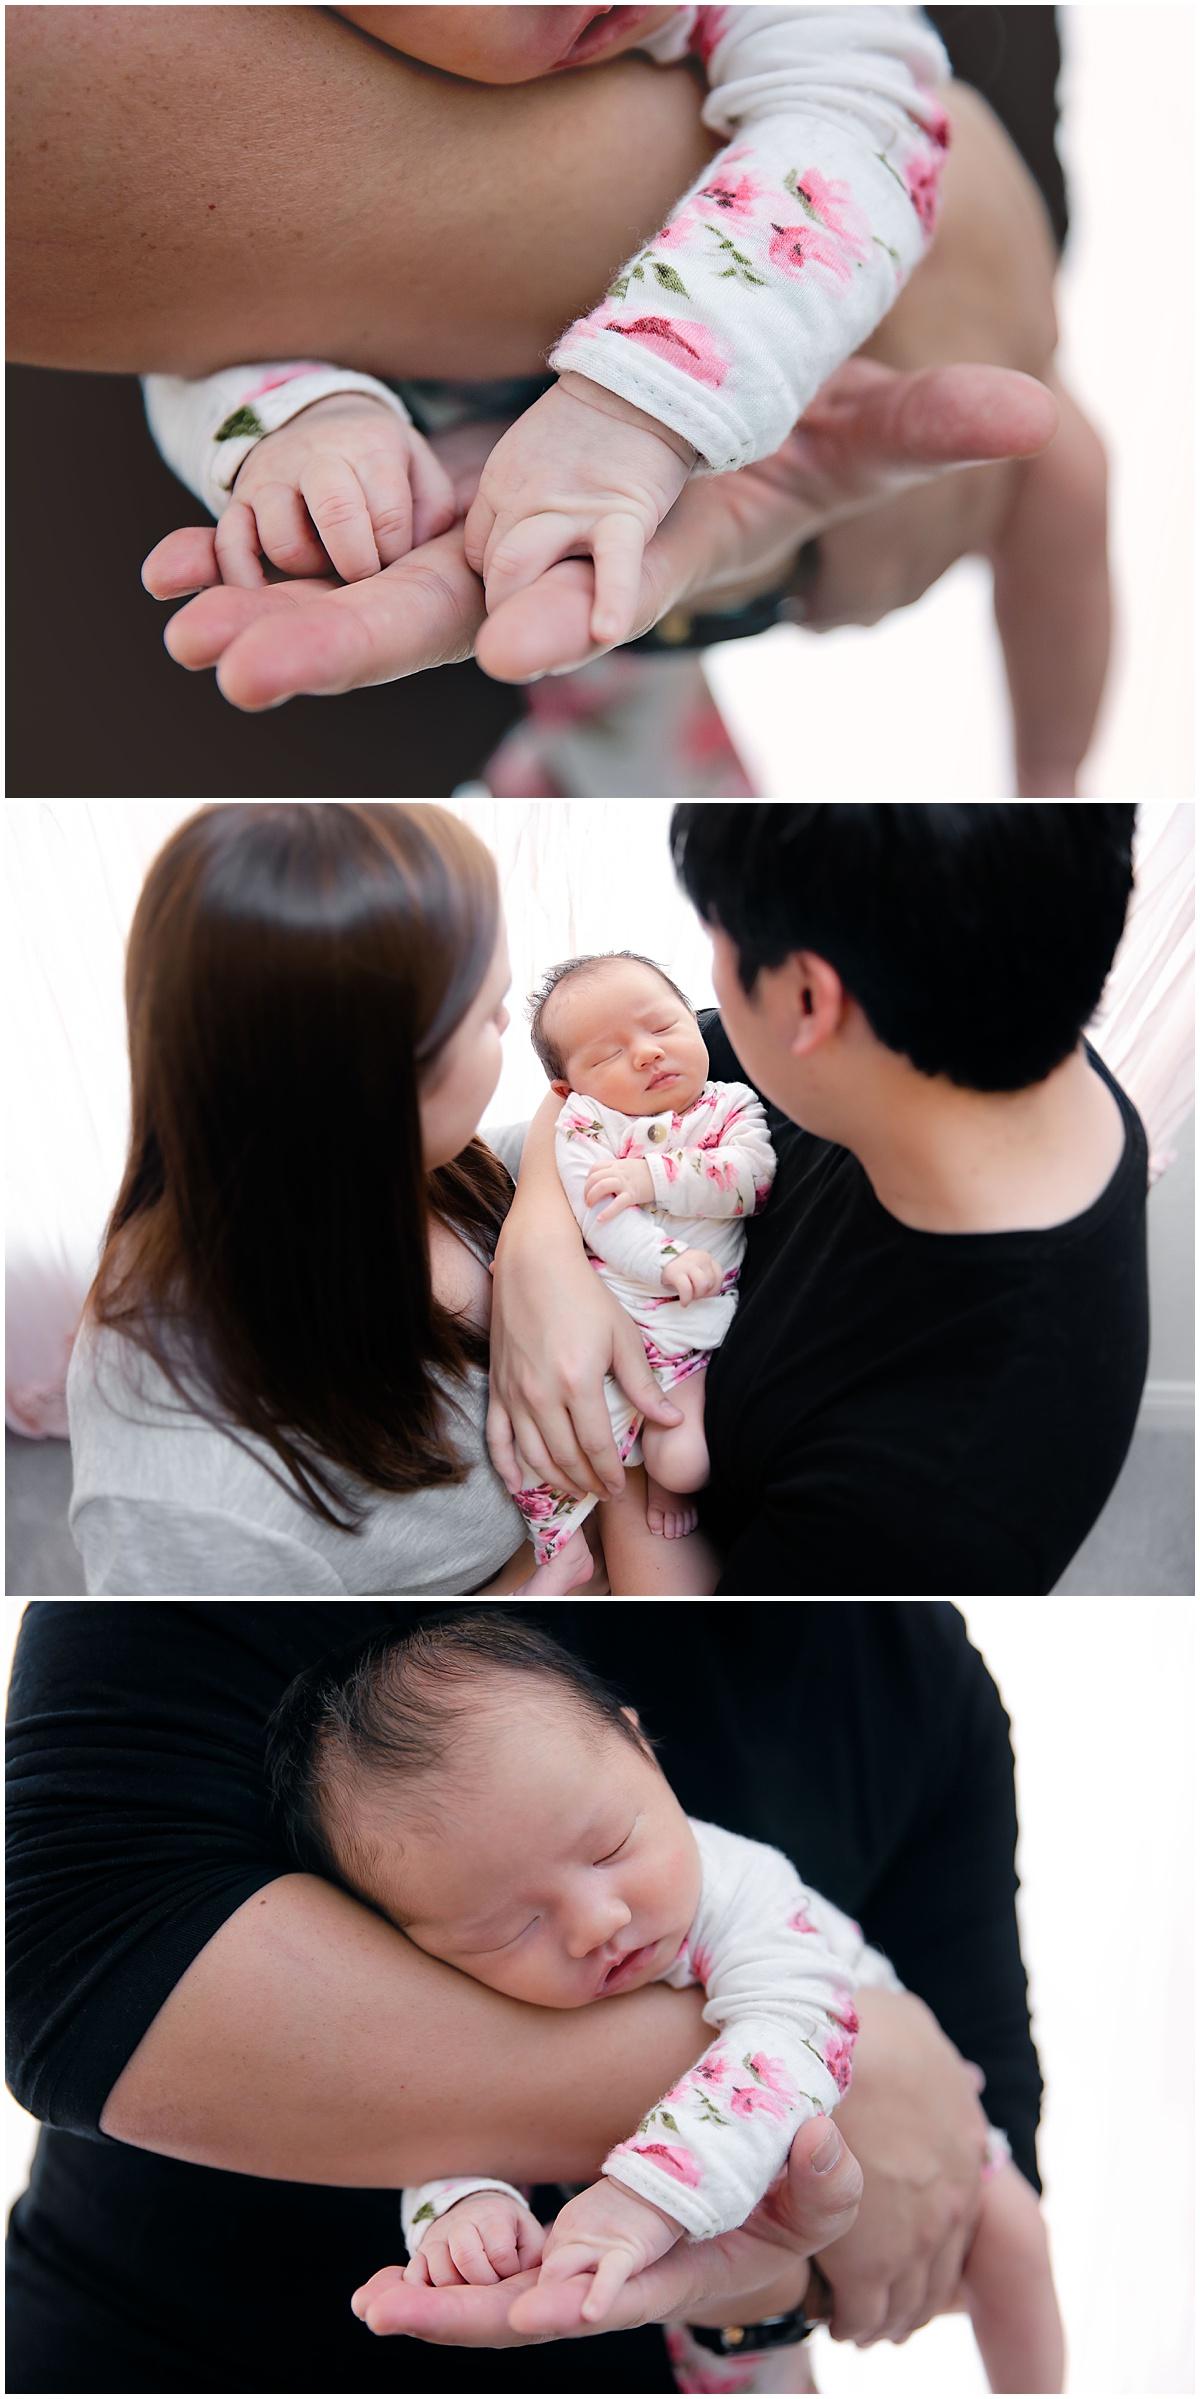 Lifestyle-newborn-family-photos-san-antonio-texas-carly-barton-photography_0009.jpg